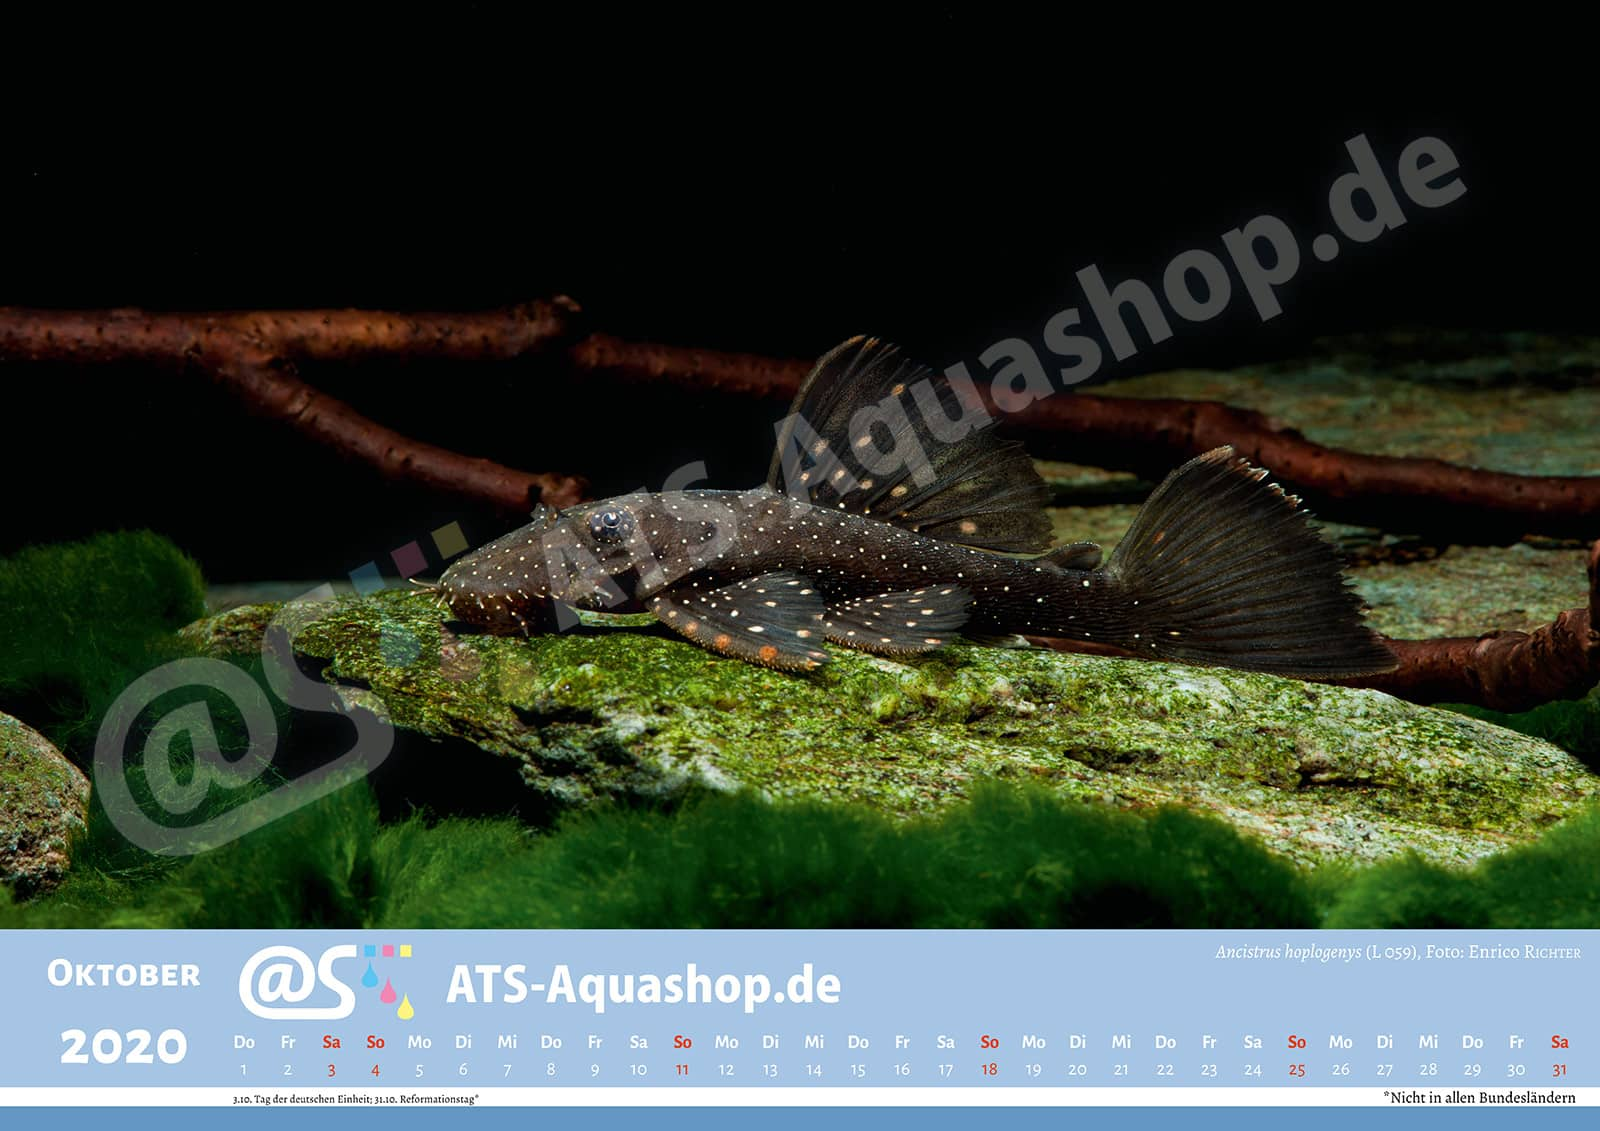 Photo calendar 2020 DIN A3: Ancistrus hoplogenys (L 059)